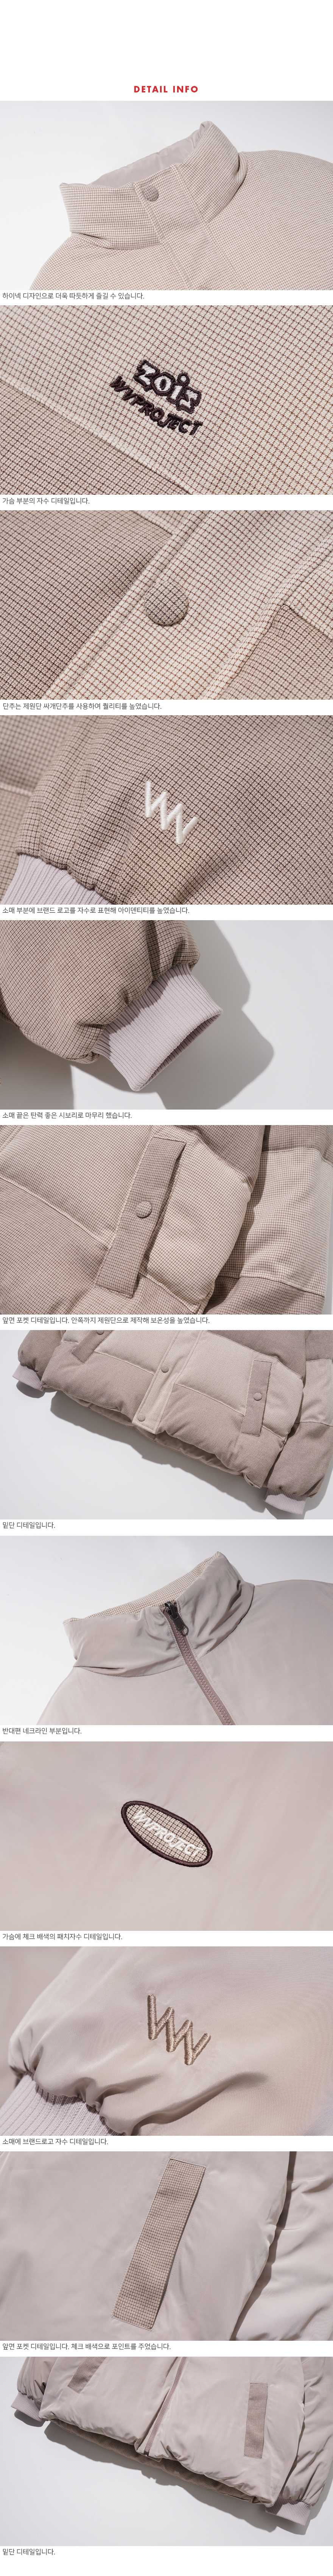 MJOT7399_detail_beige_cj.jpg